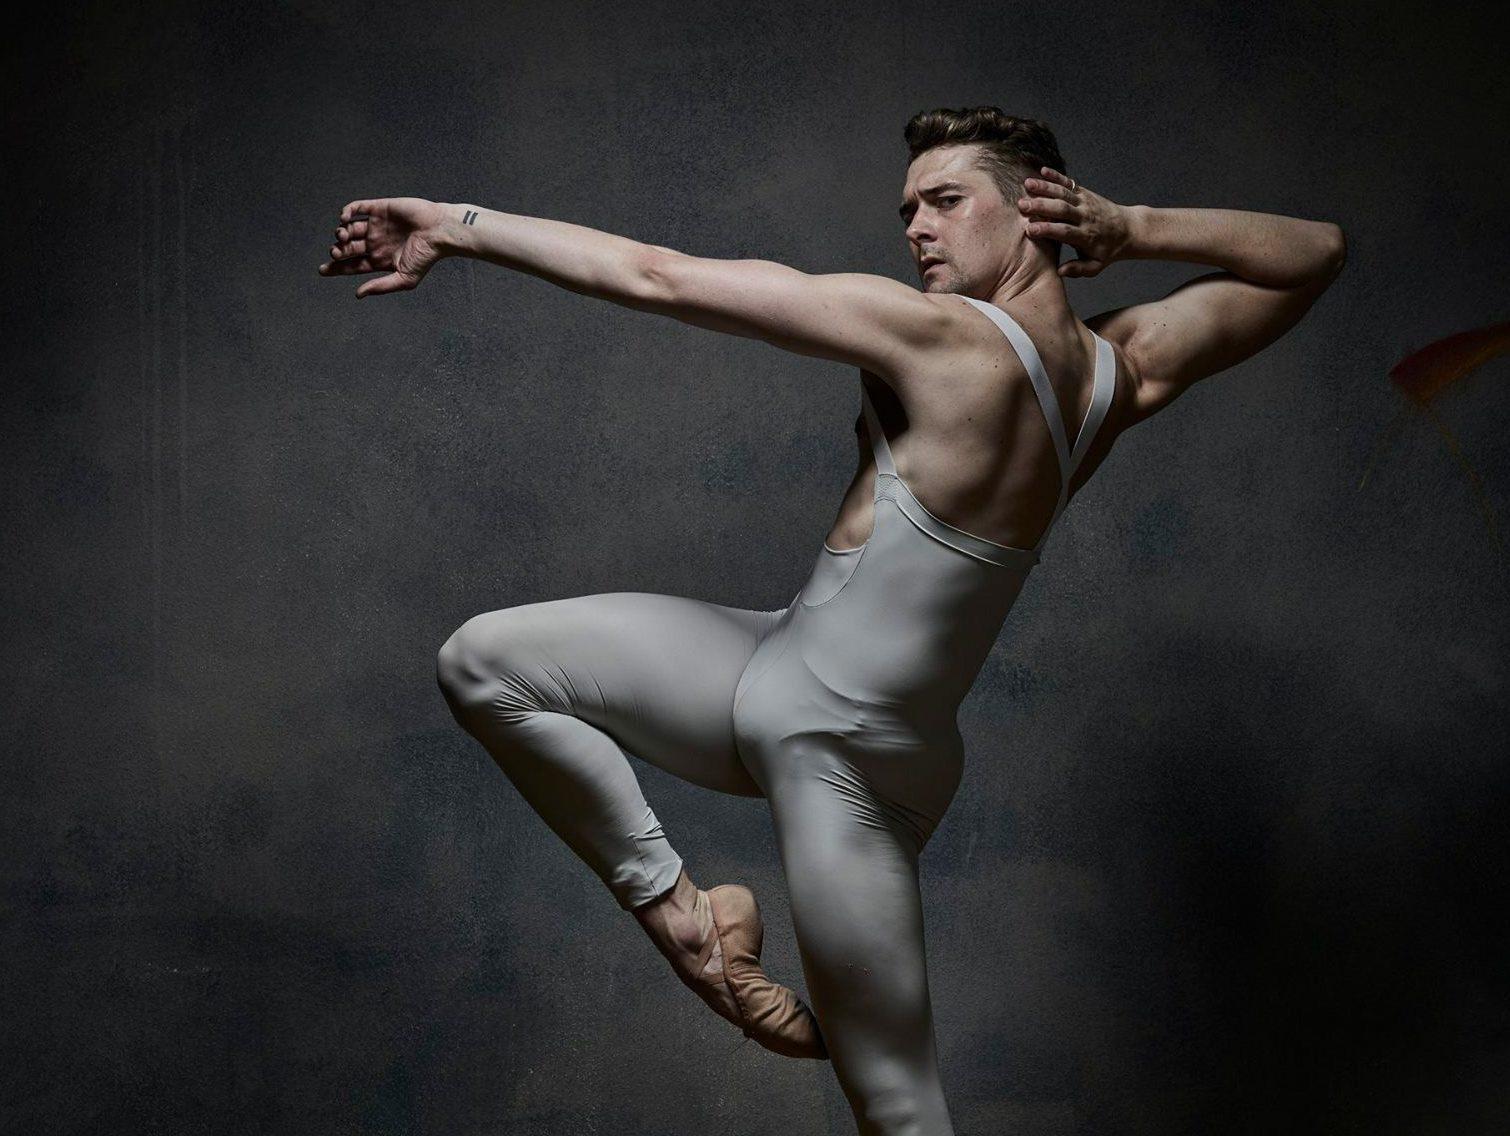 Aberdeen-born dancer Greig Matthews is set to take part in a digital performance at DanceLive 2020